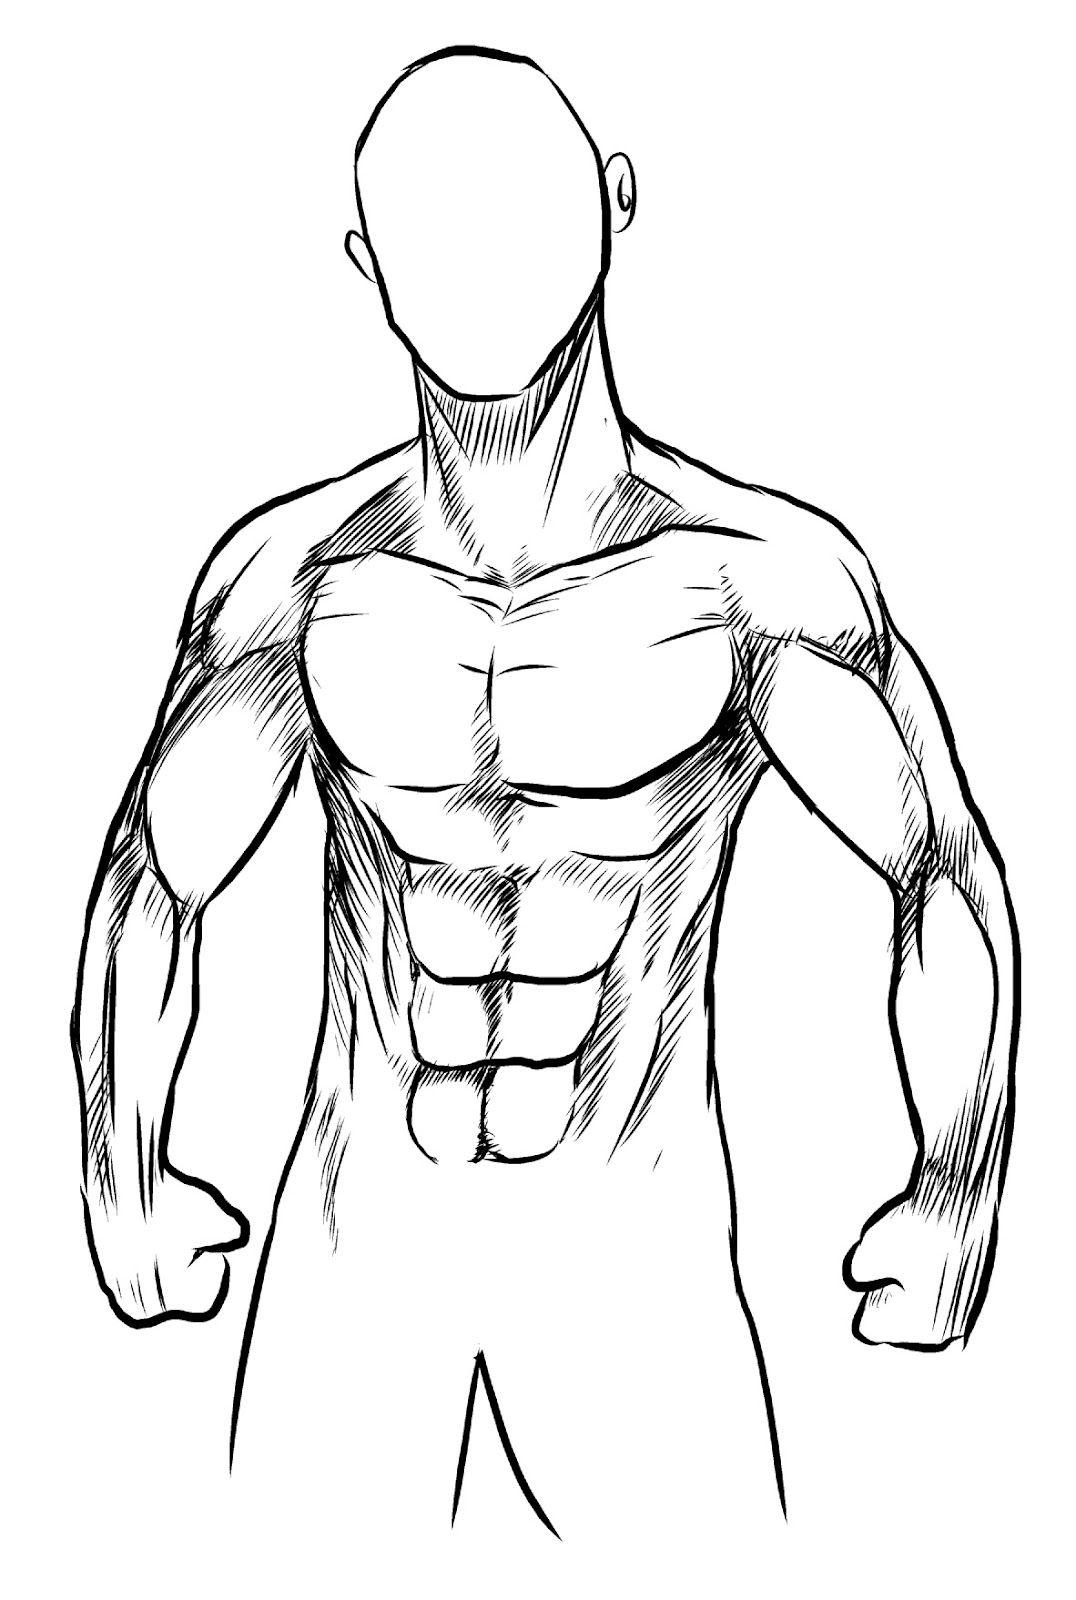 musculos dibujo - Buscar con Google | Cuerpo Humano | Pinterest ...